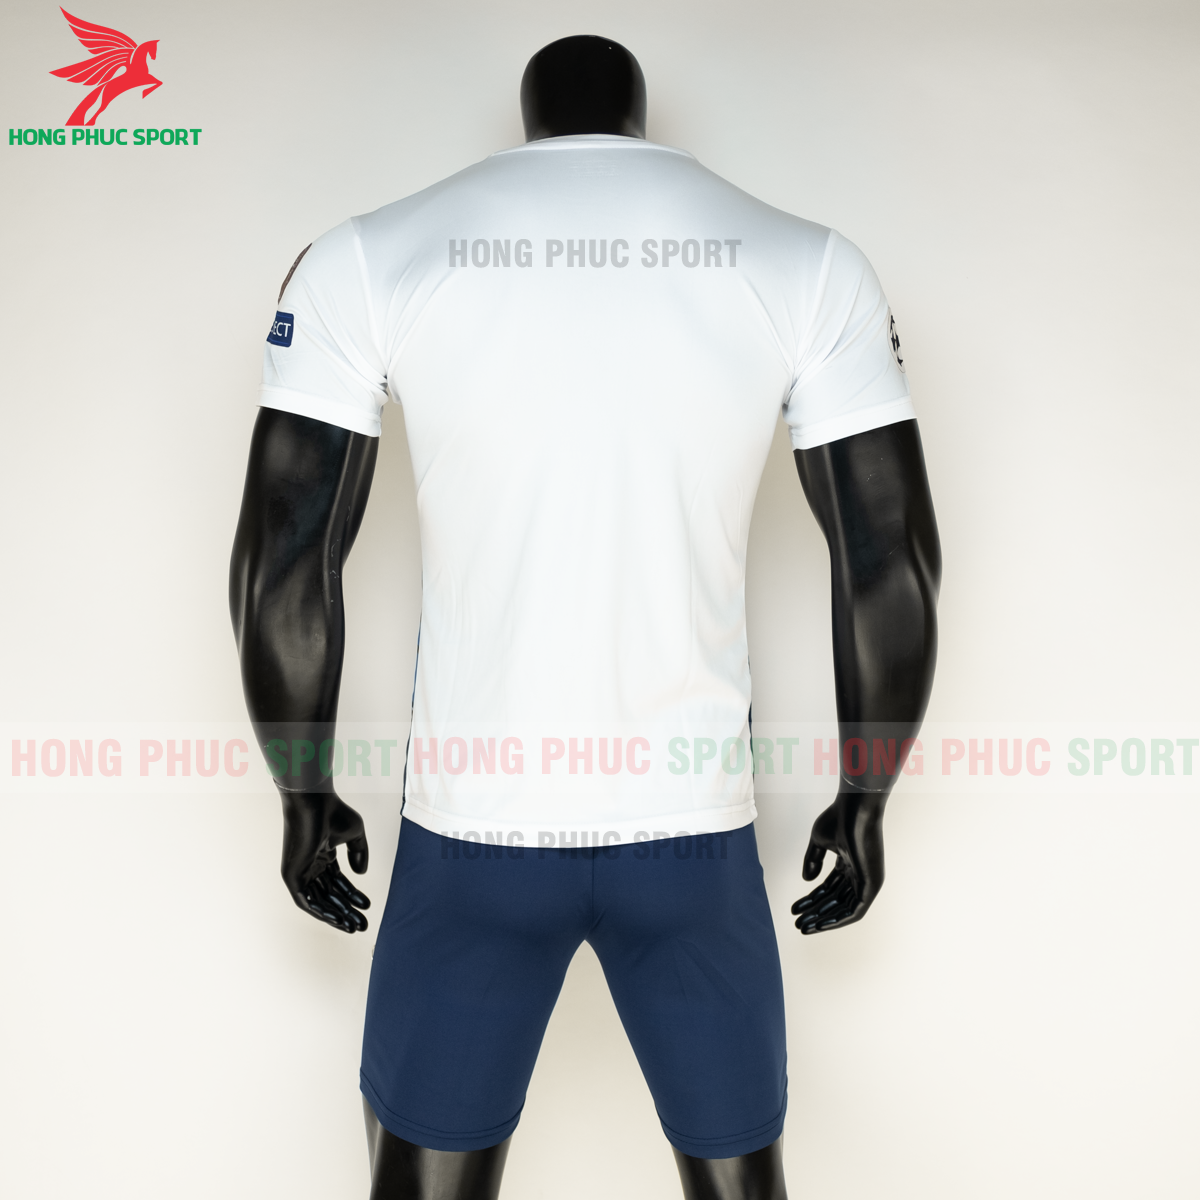 https://cdn.hongphucsport.com/unsafe/s4.shopbay.vn/files/285/ao-bong-da-tottenham-20-21-phien-ban-fan-8-5faf5ea55ea2c.png